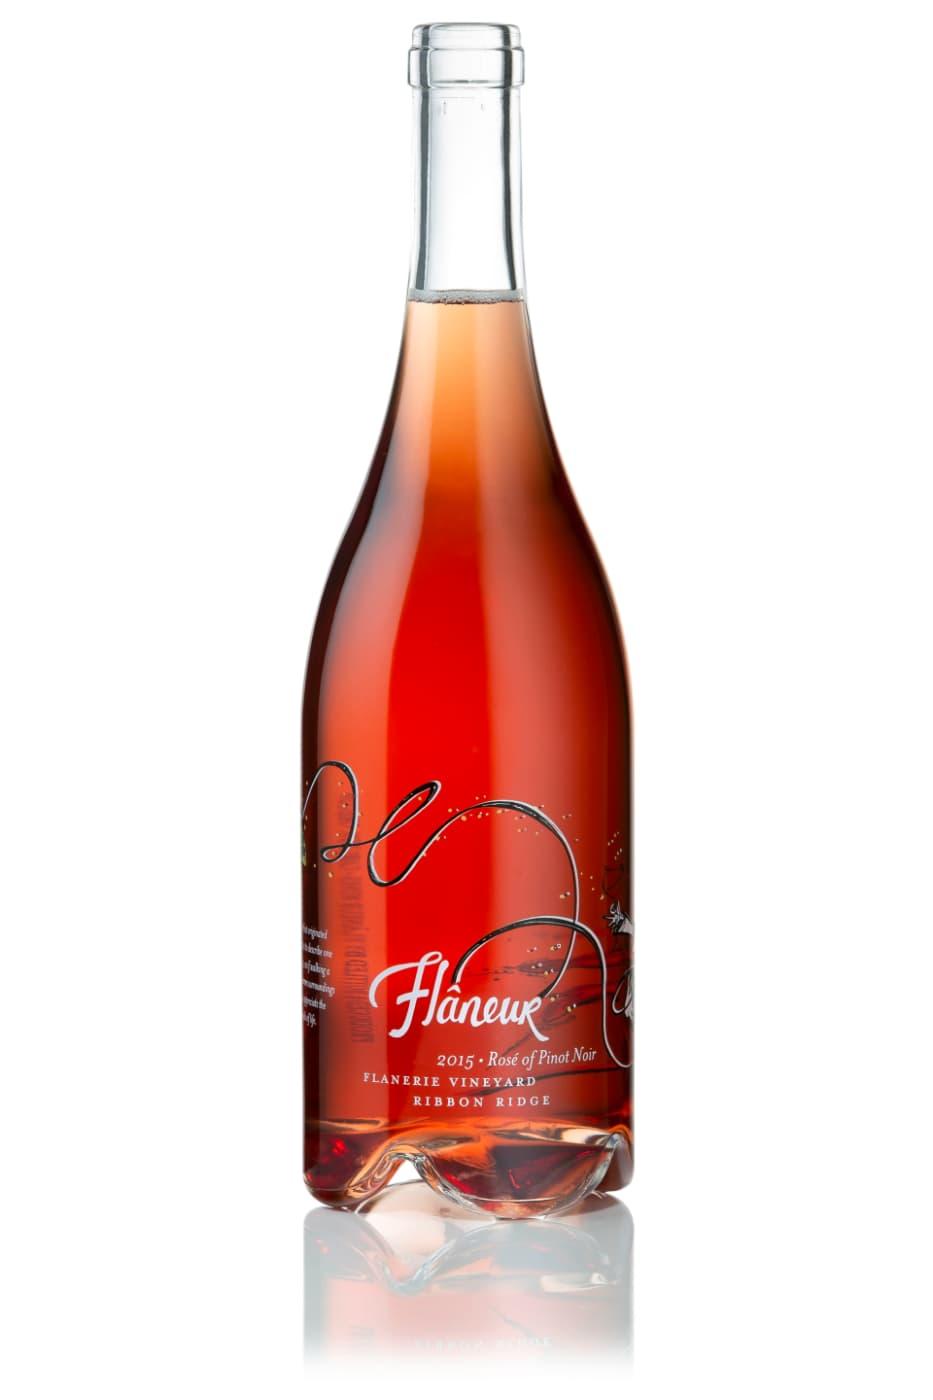 Flaneur 2015 Rose